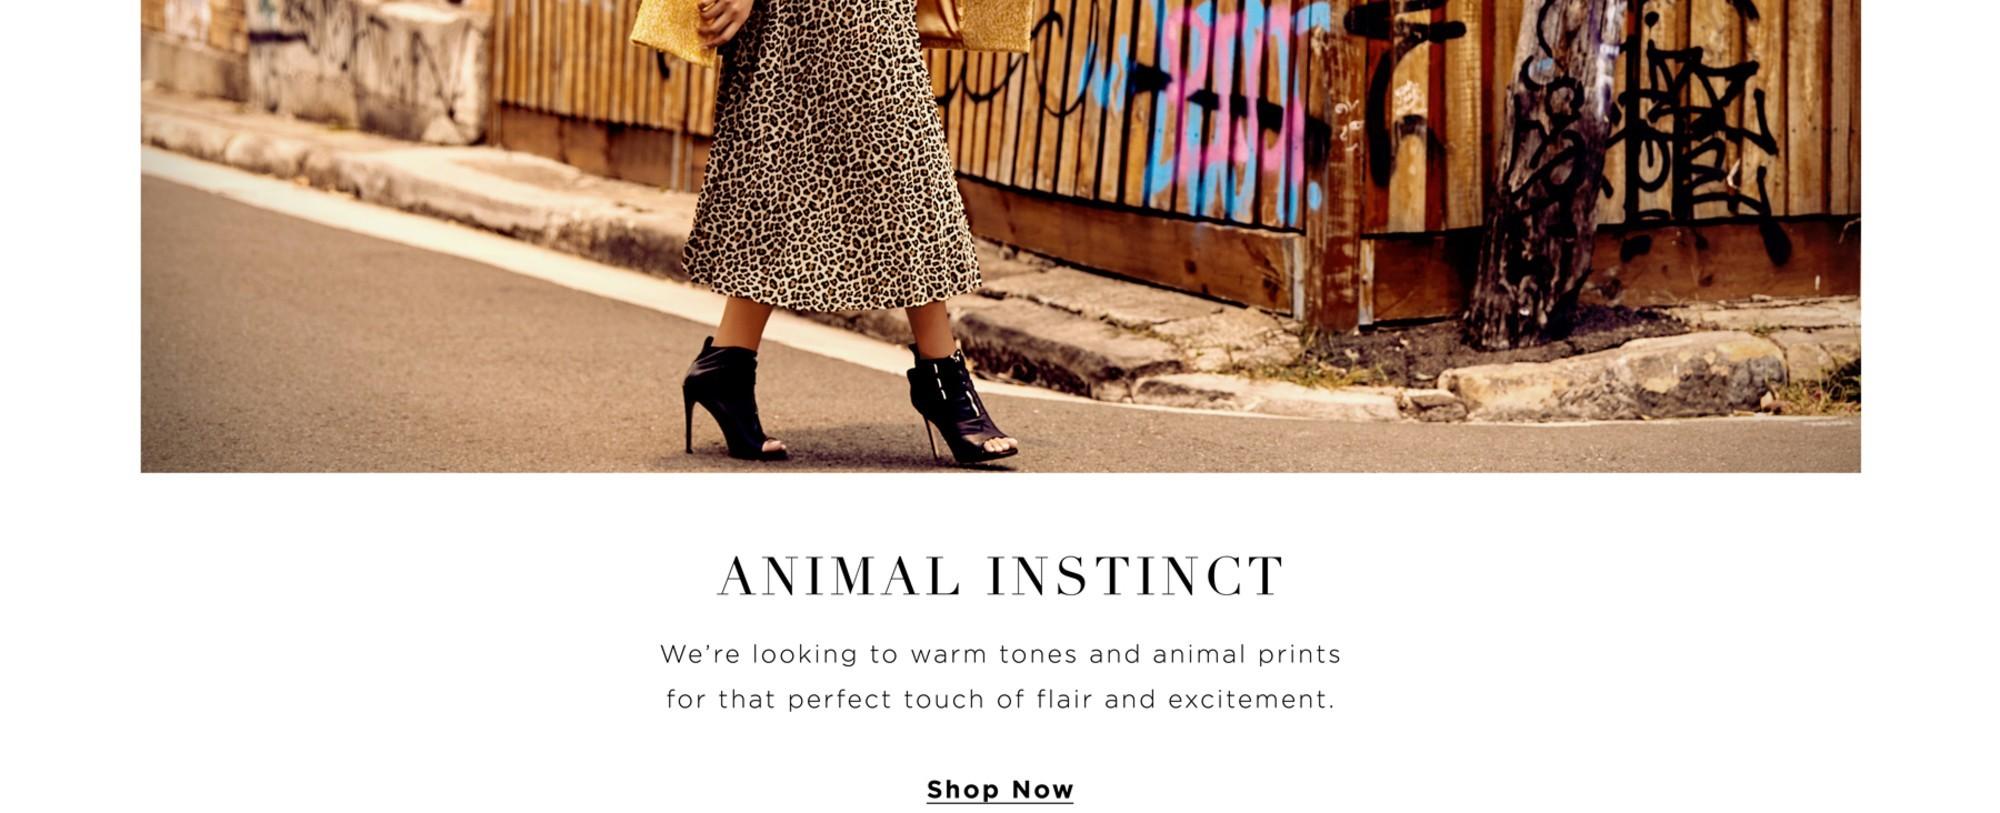 City Chic Animal Instinct Collection